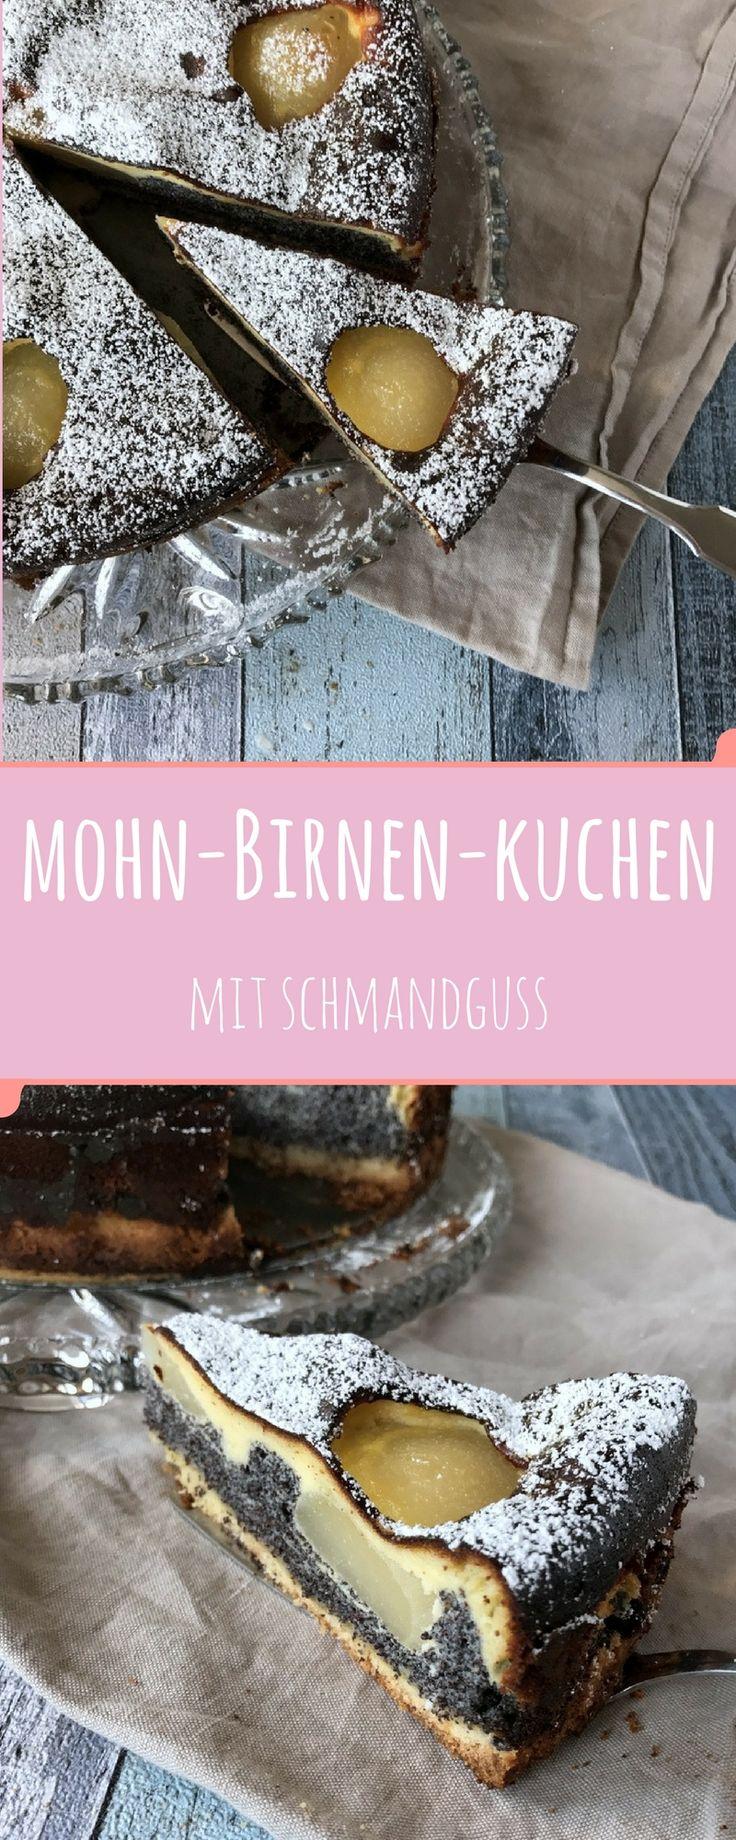 Quaker küche design  best kuchen images on pinterest  cake baking cookies and desserts